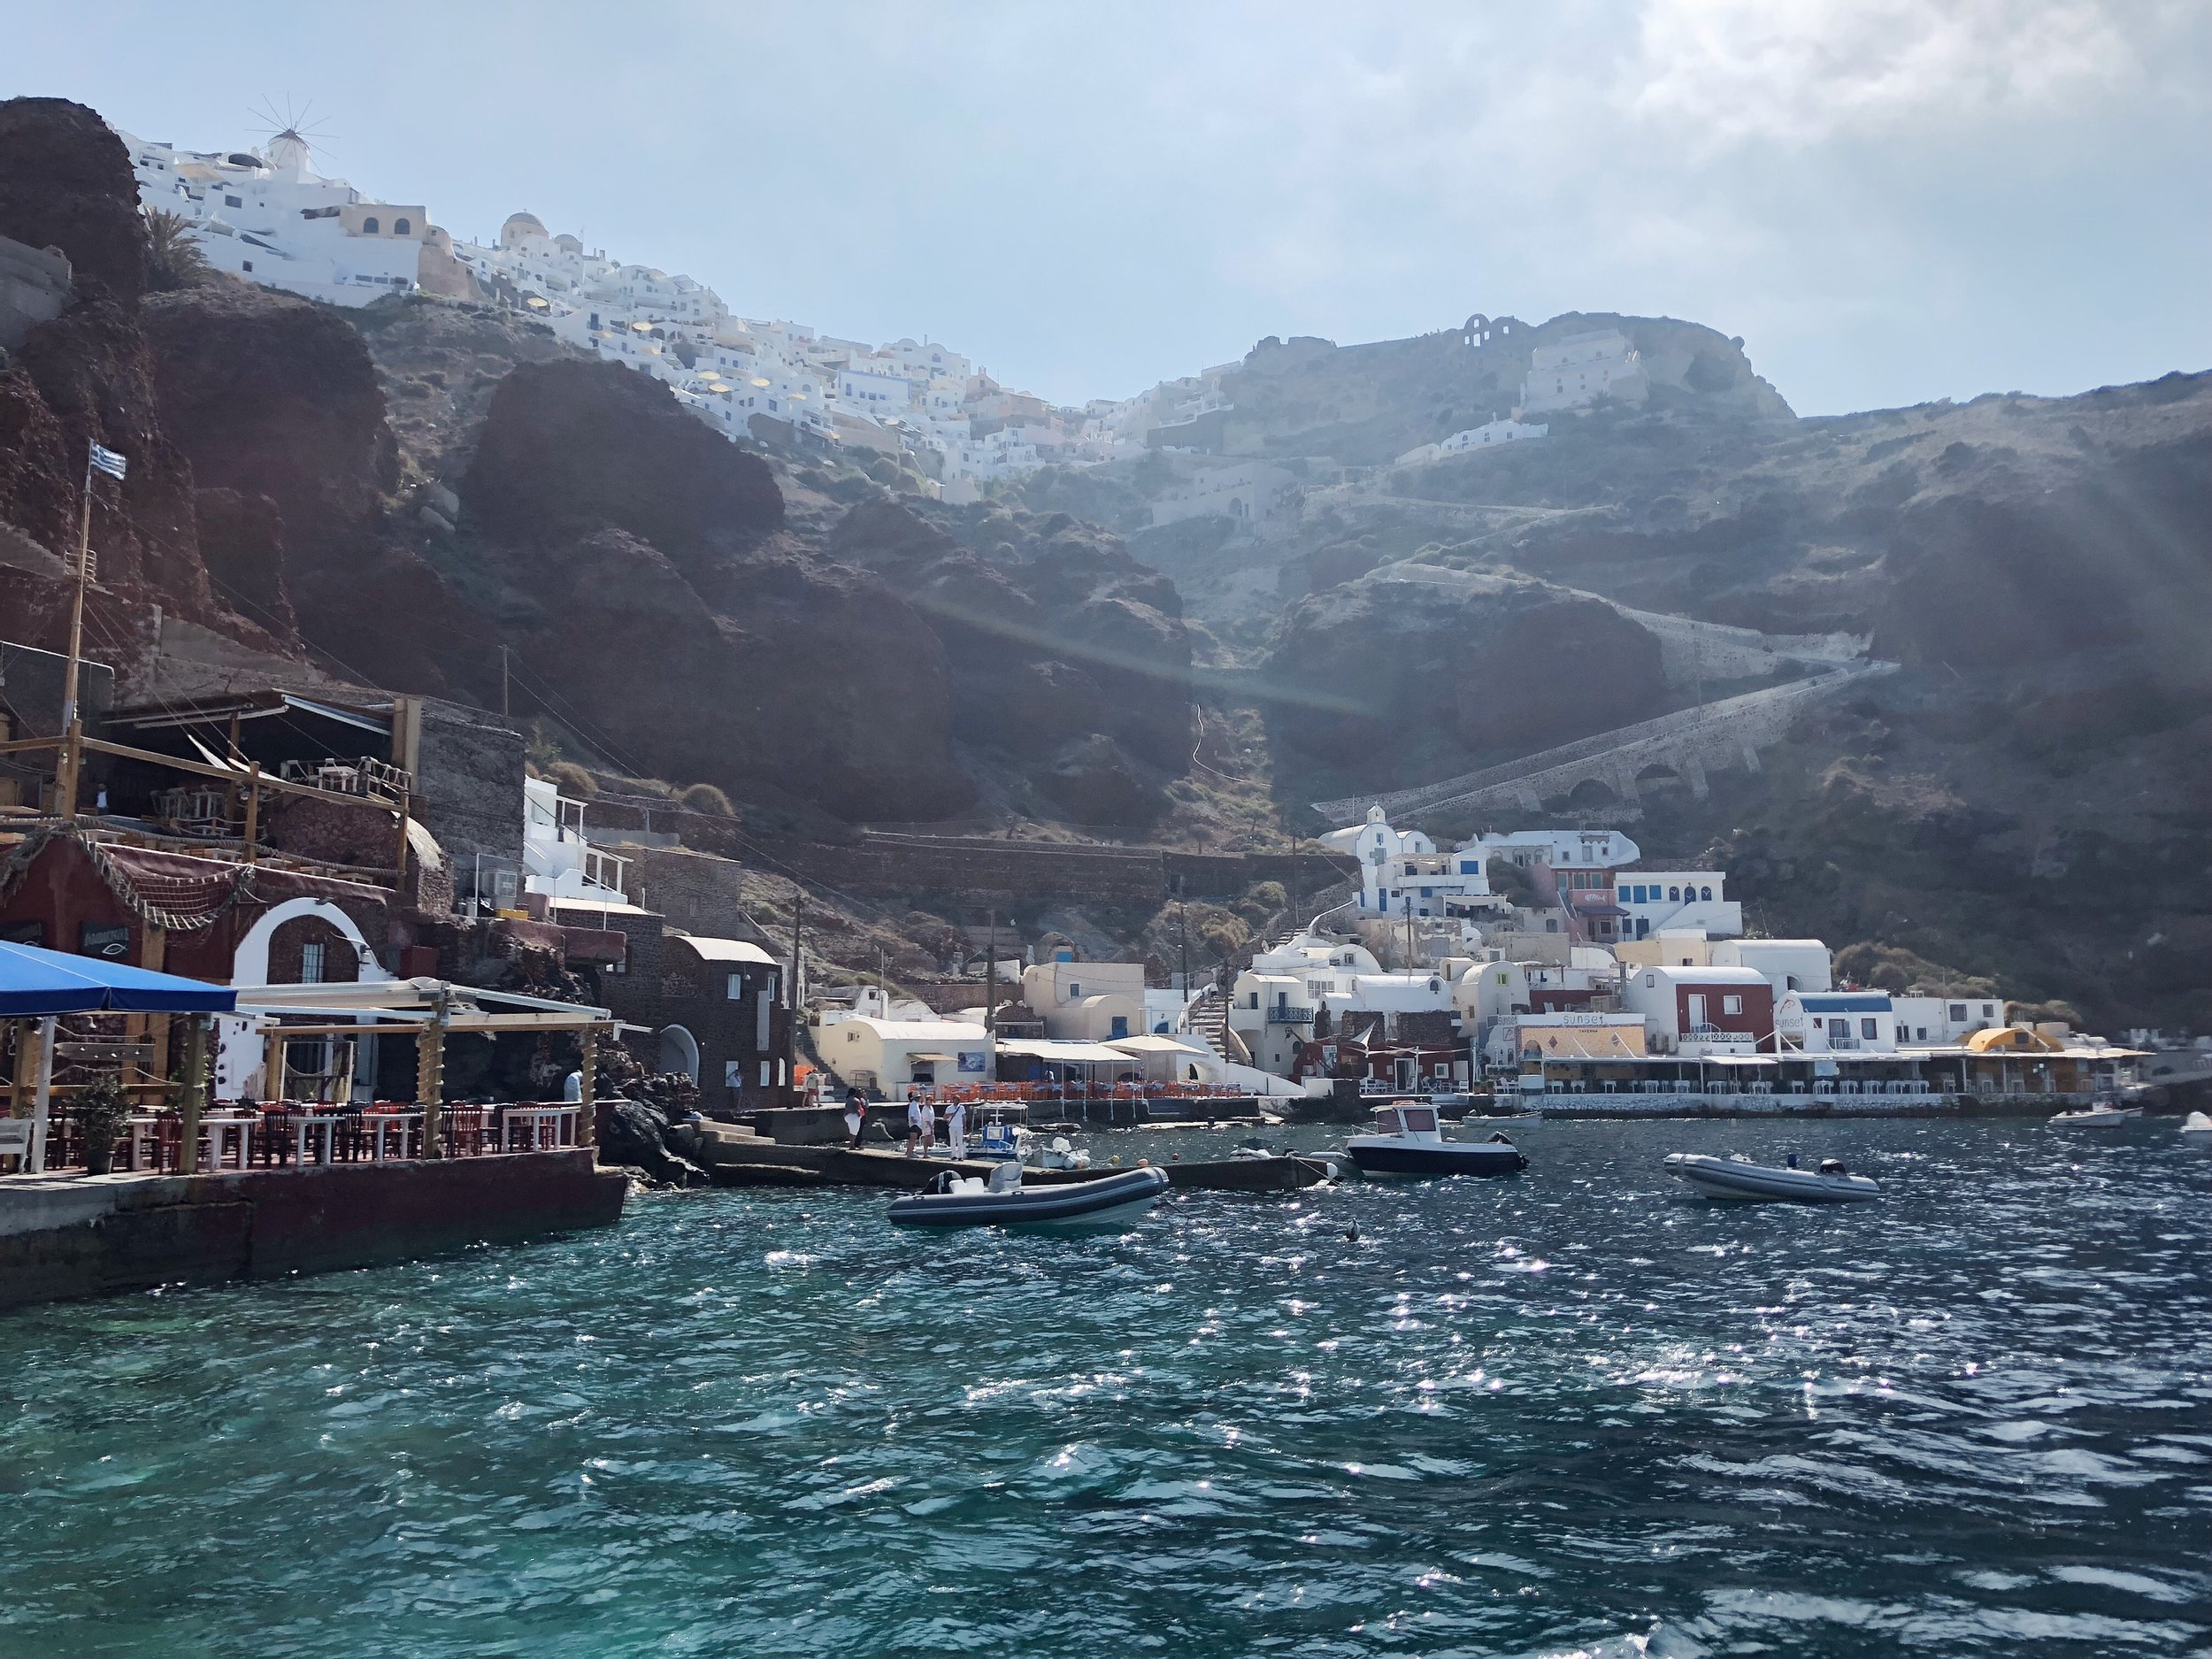 Santorini Oia Caldera Photograph Europe Travel Diary.jpg